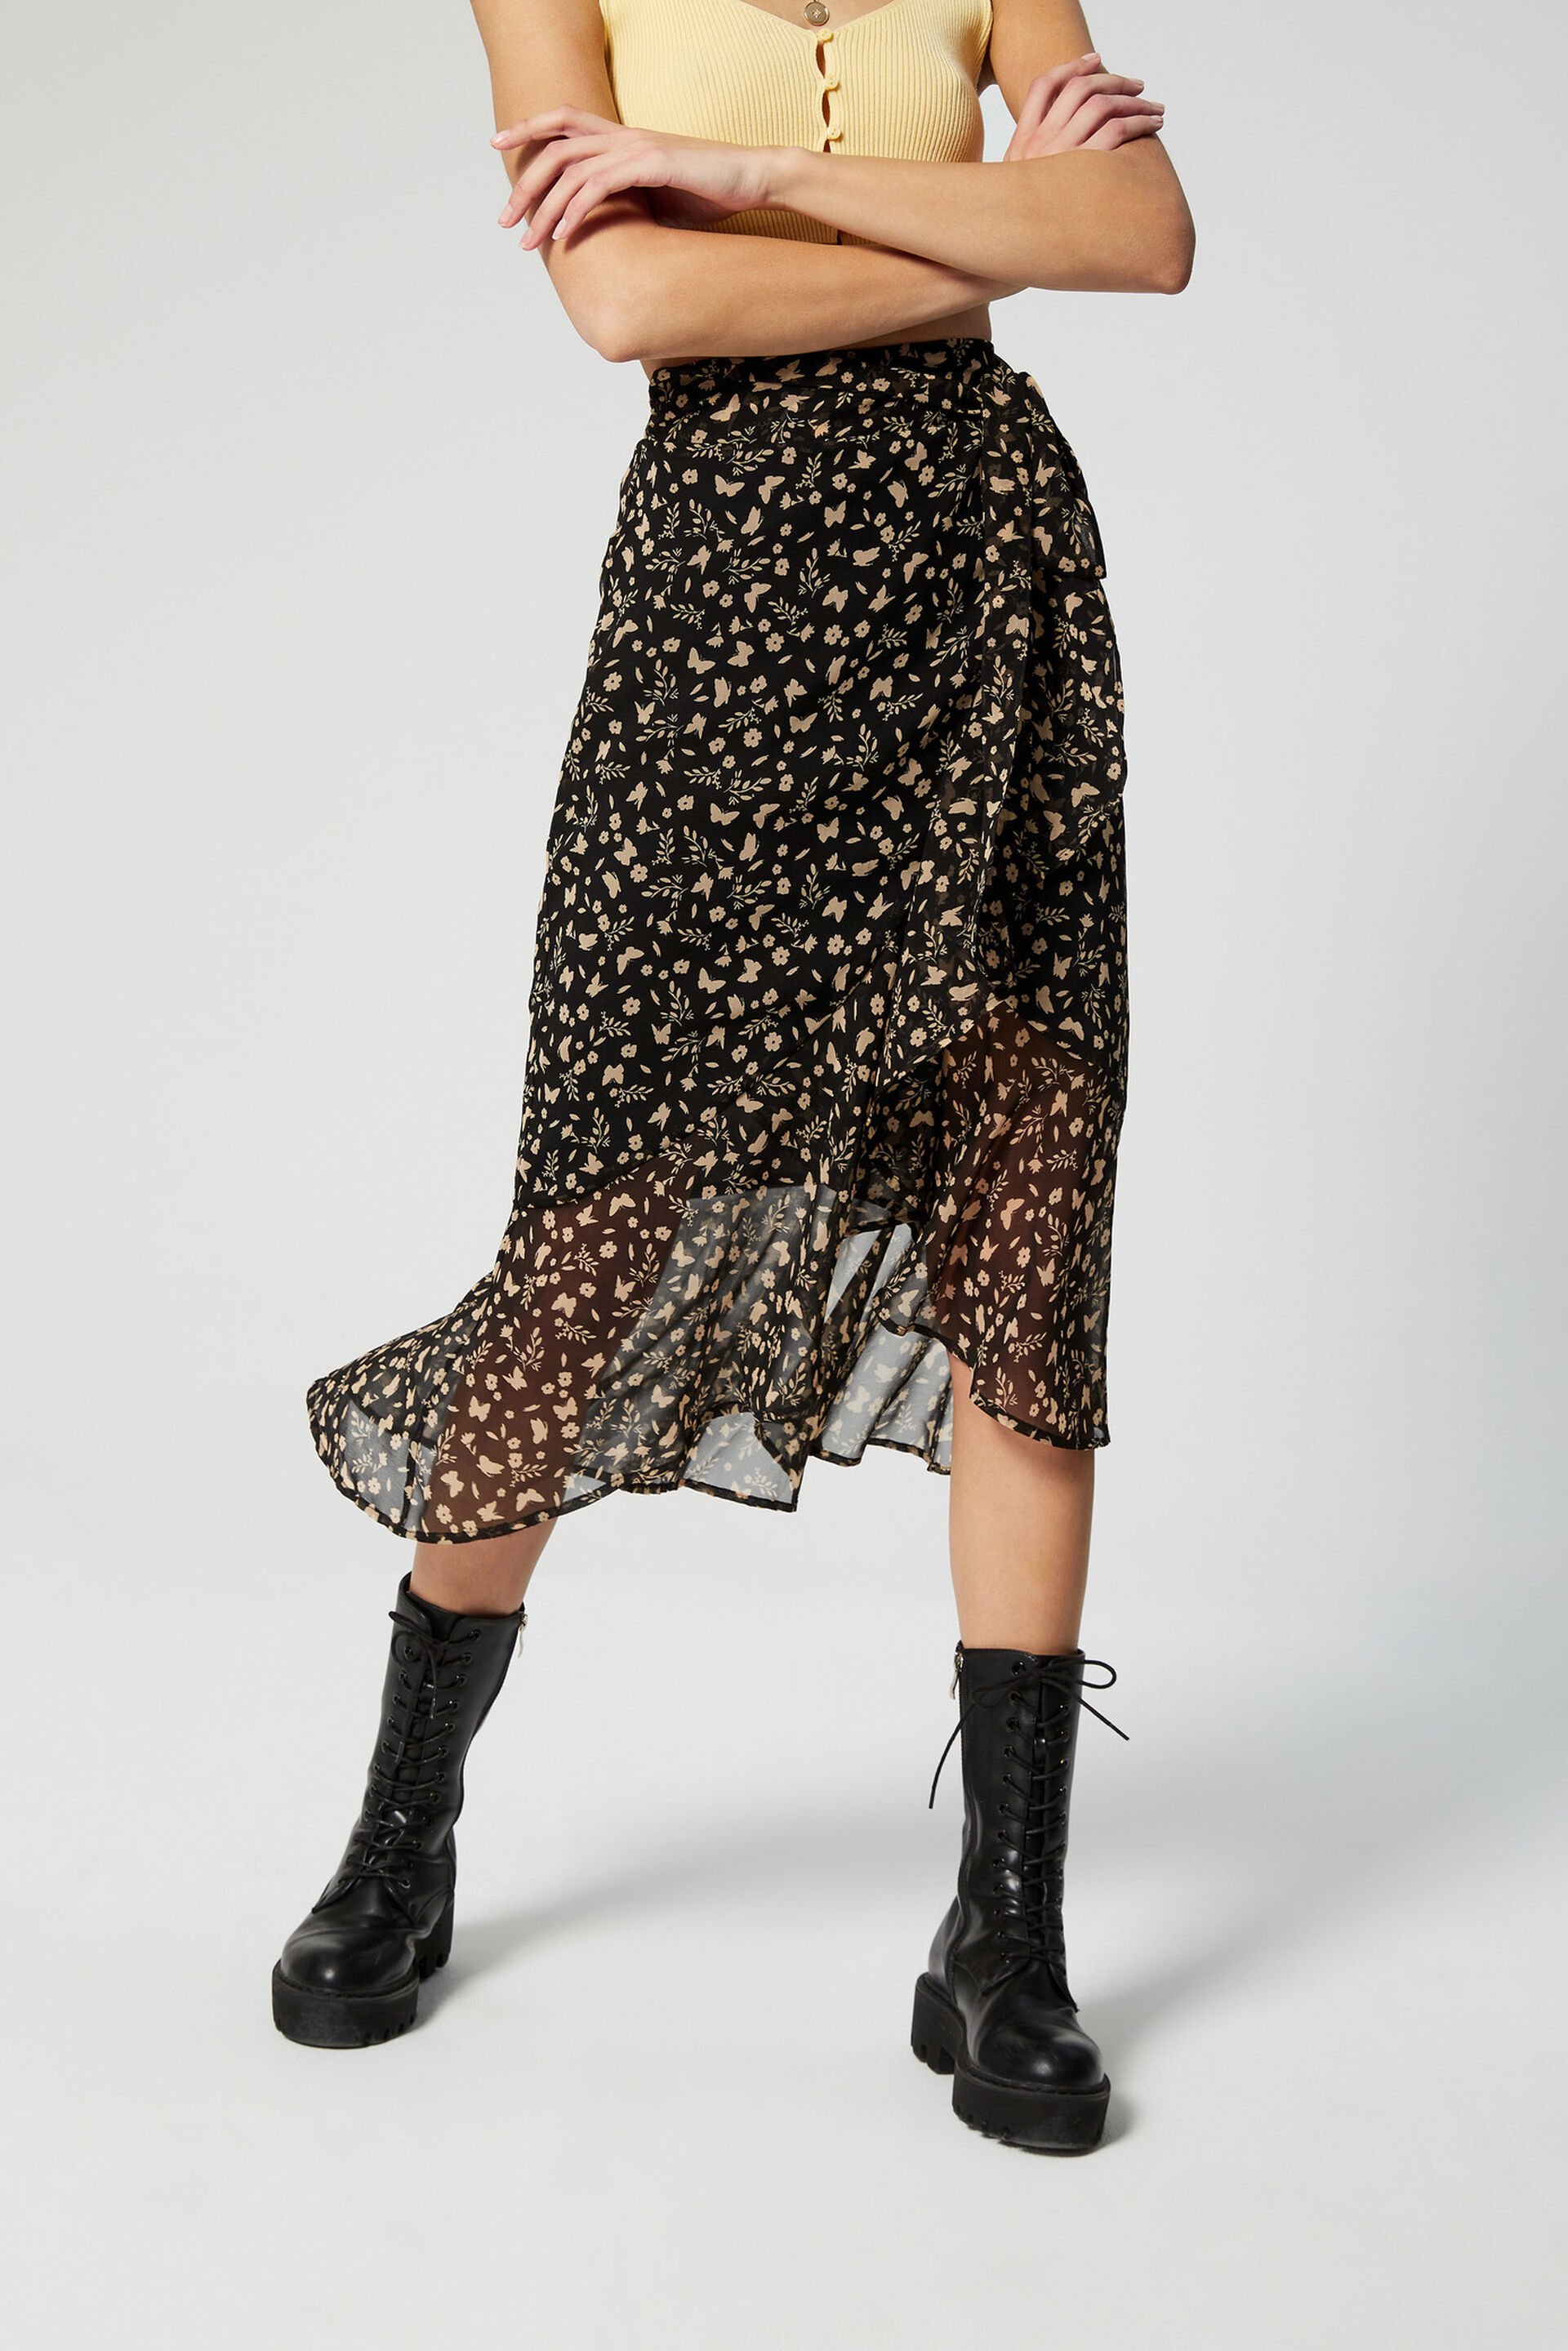 Floral mid-length skirt